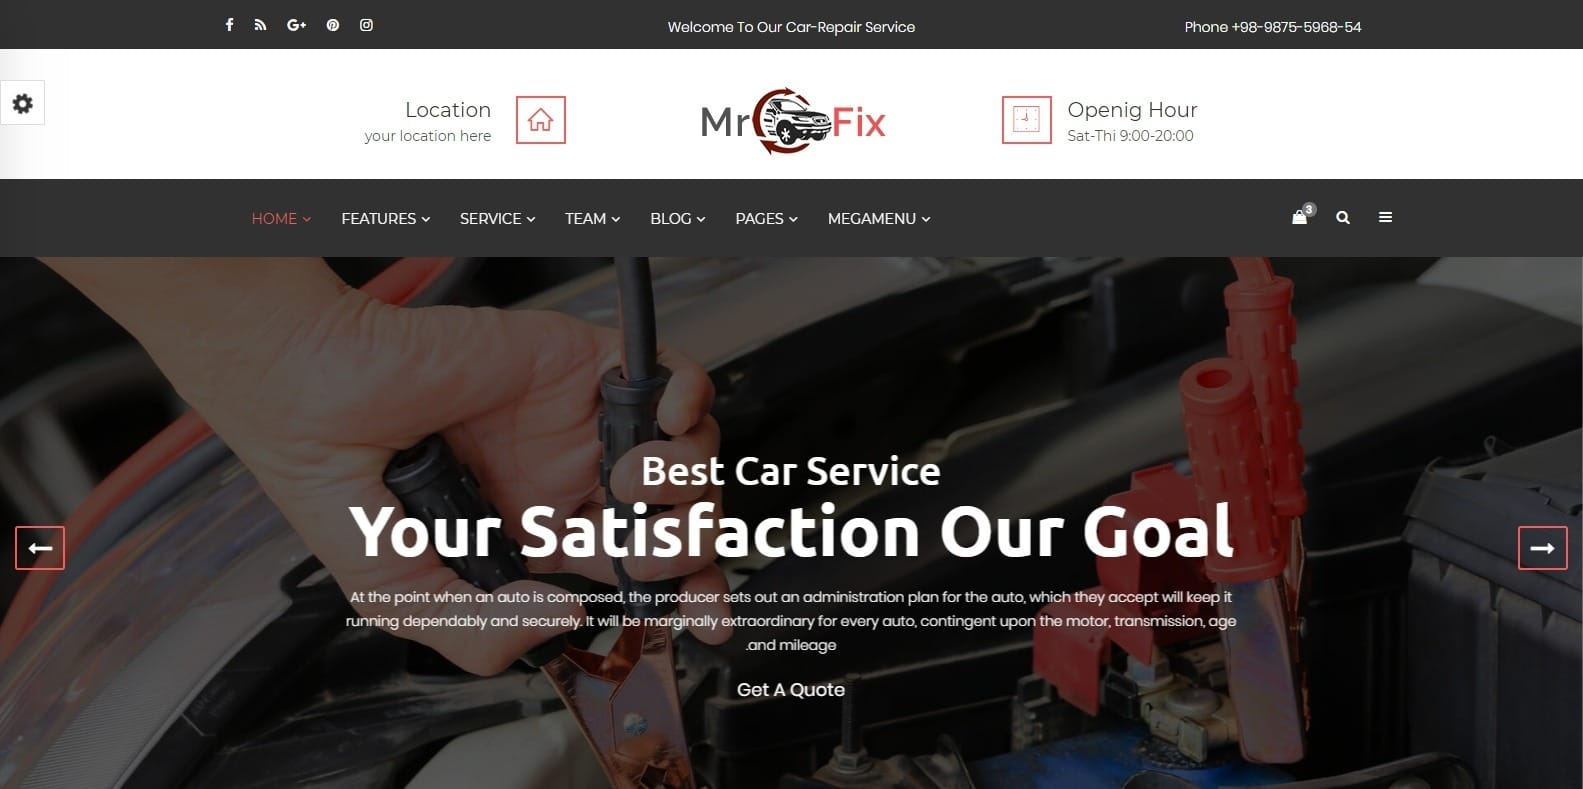 mrfix-automotive-website-template